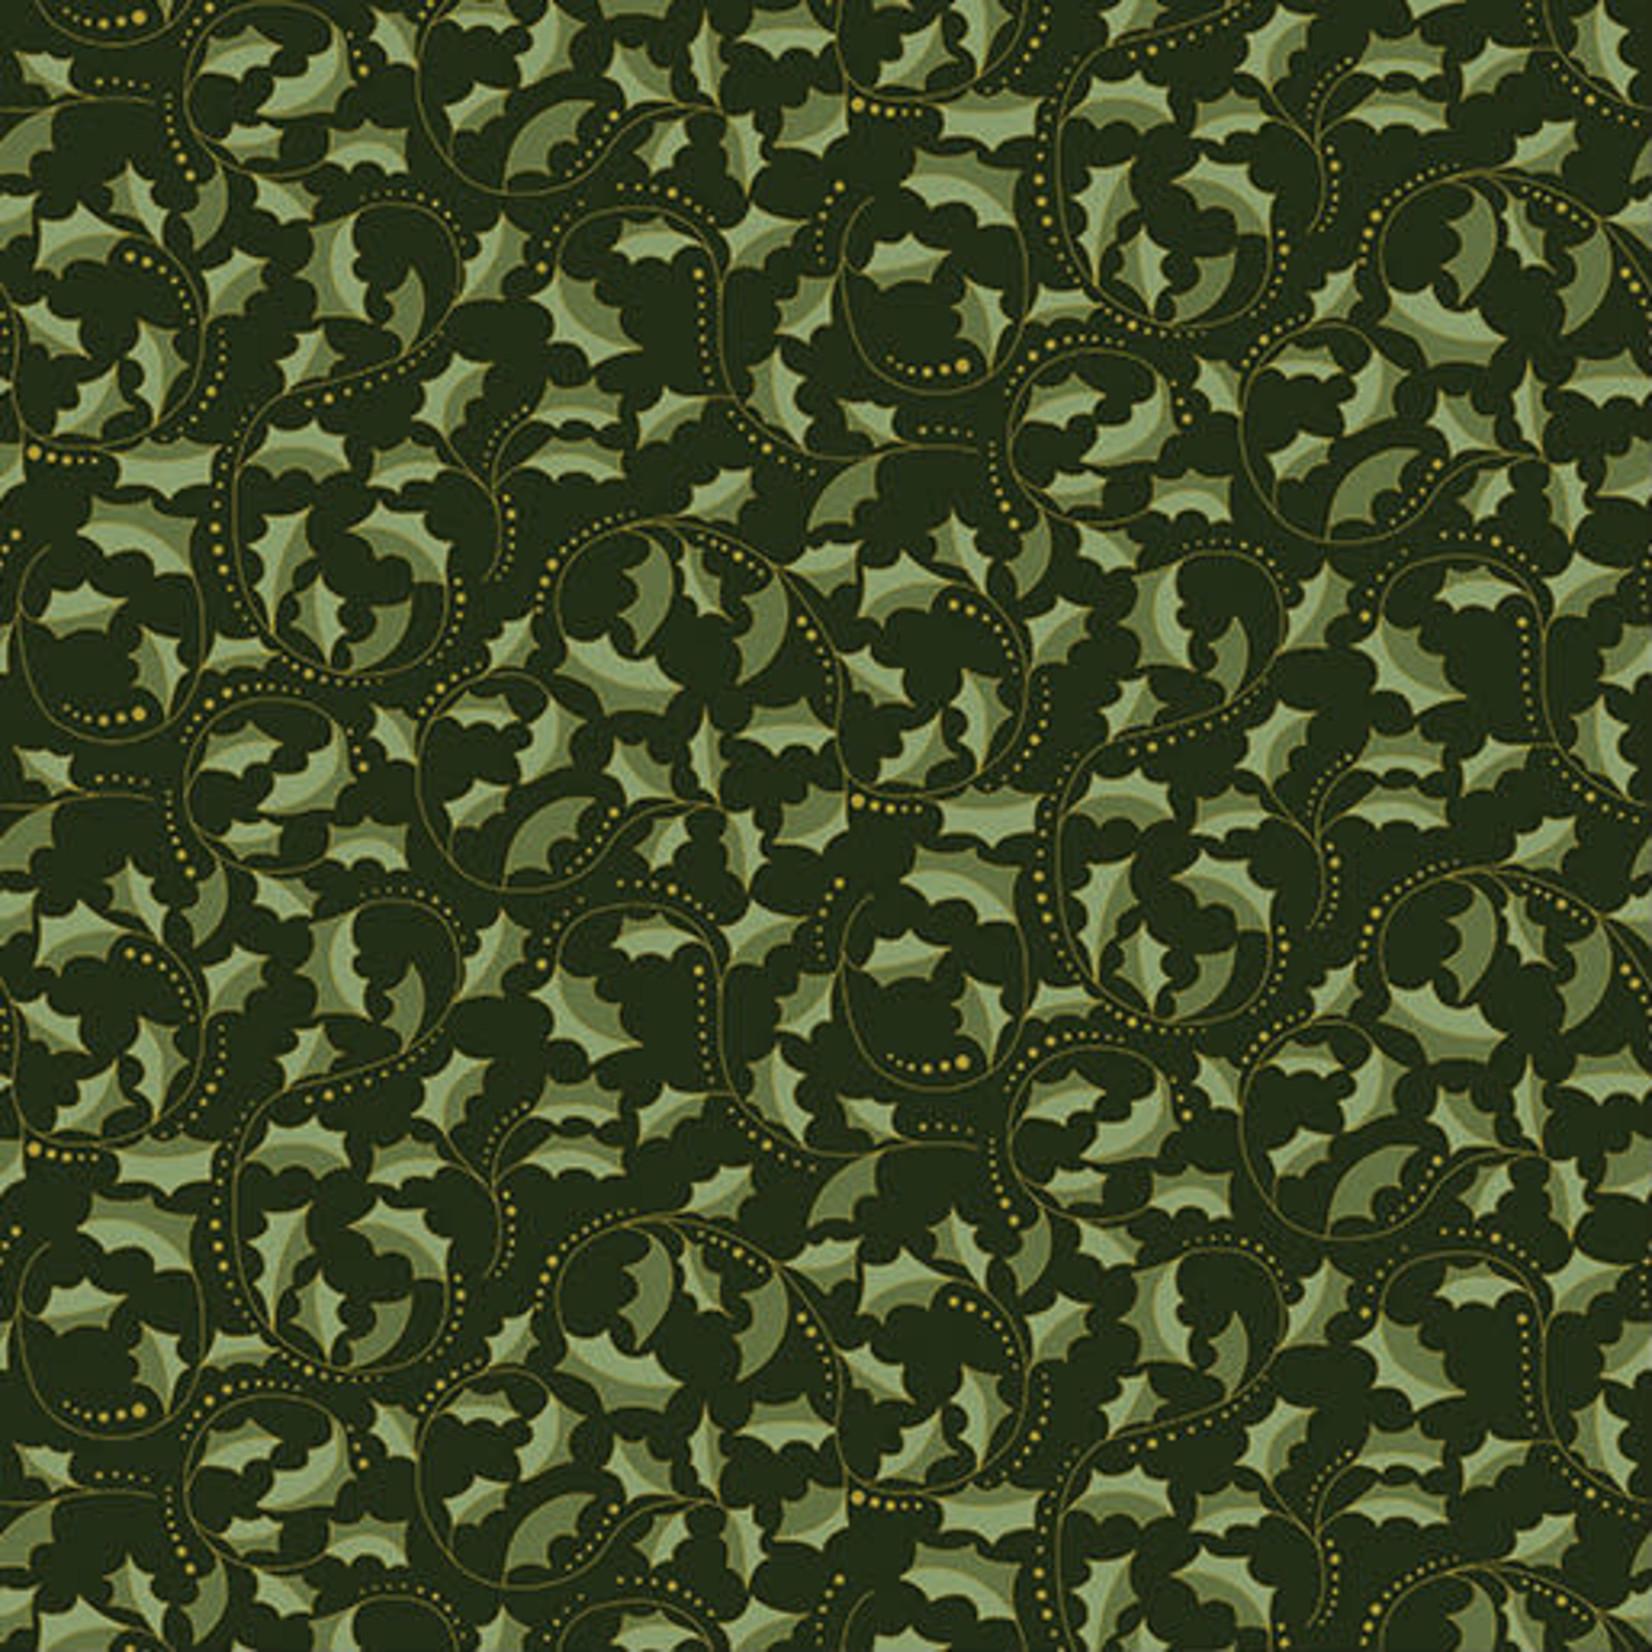 Benartex Studio Festive Chikadees - Golden Leaf Scroll - Dark Green